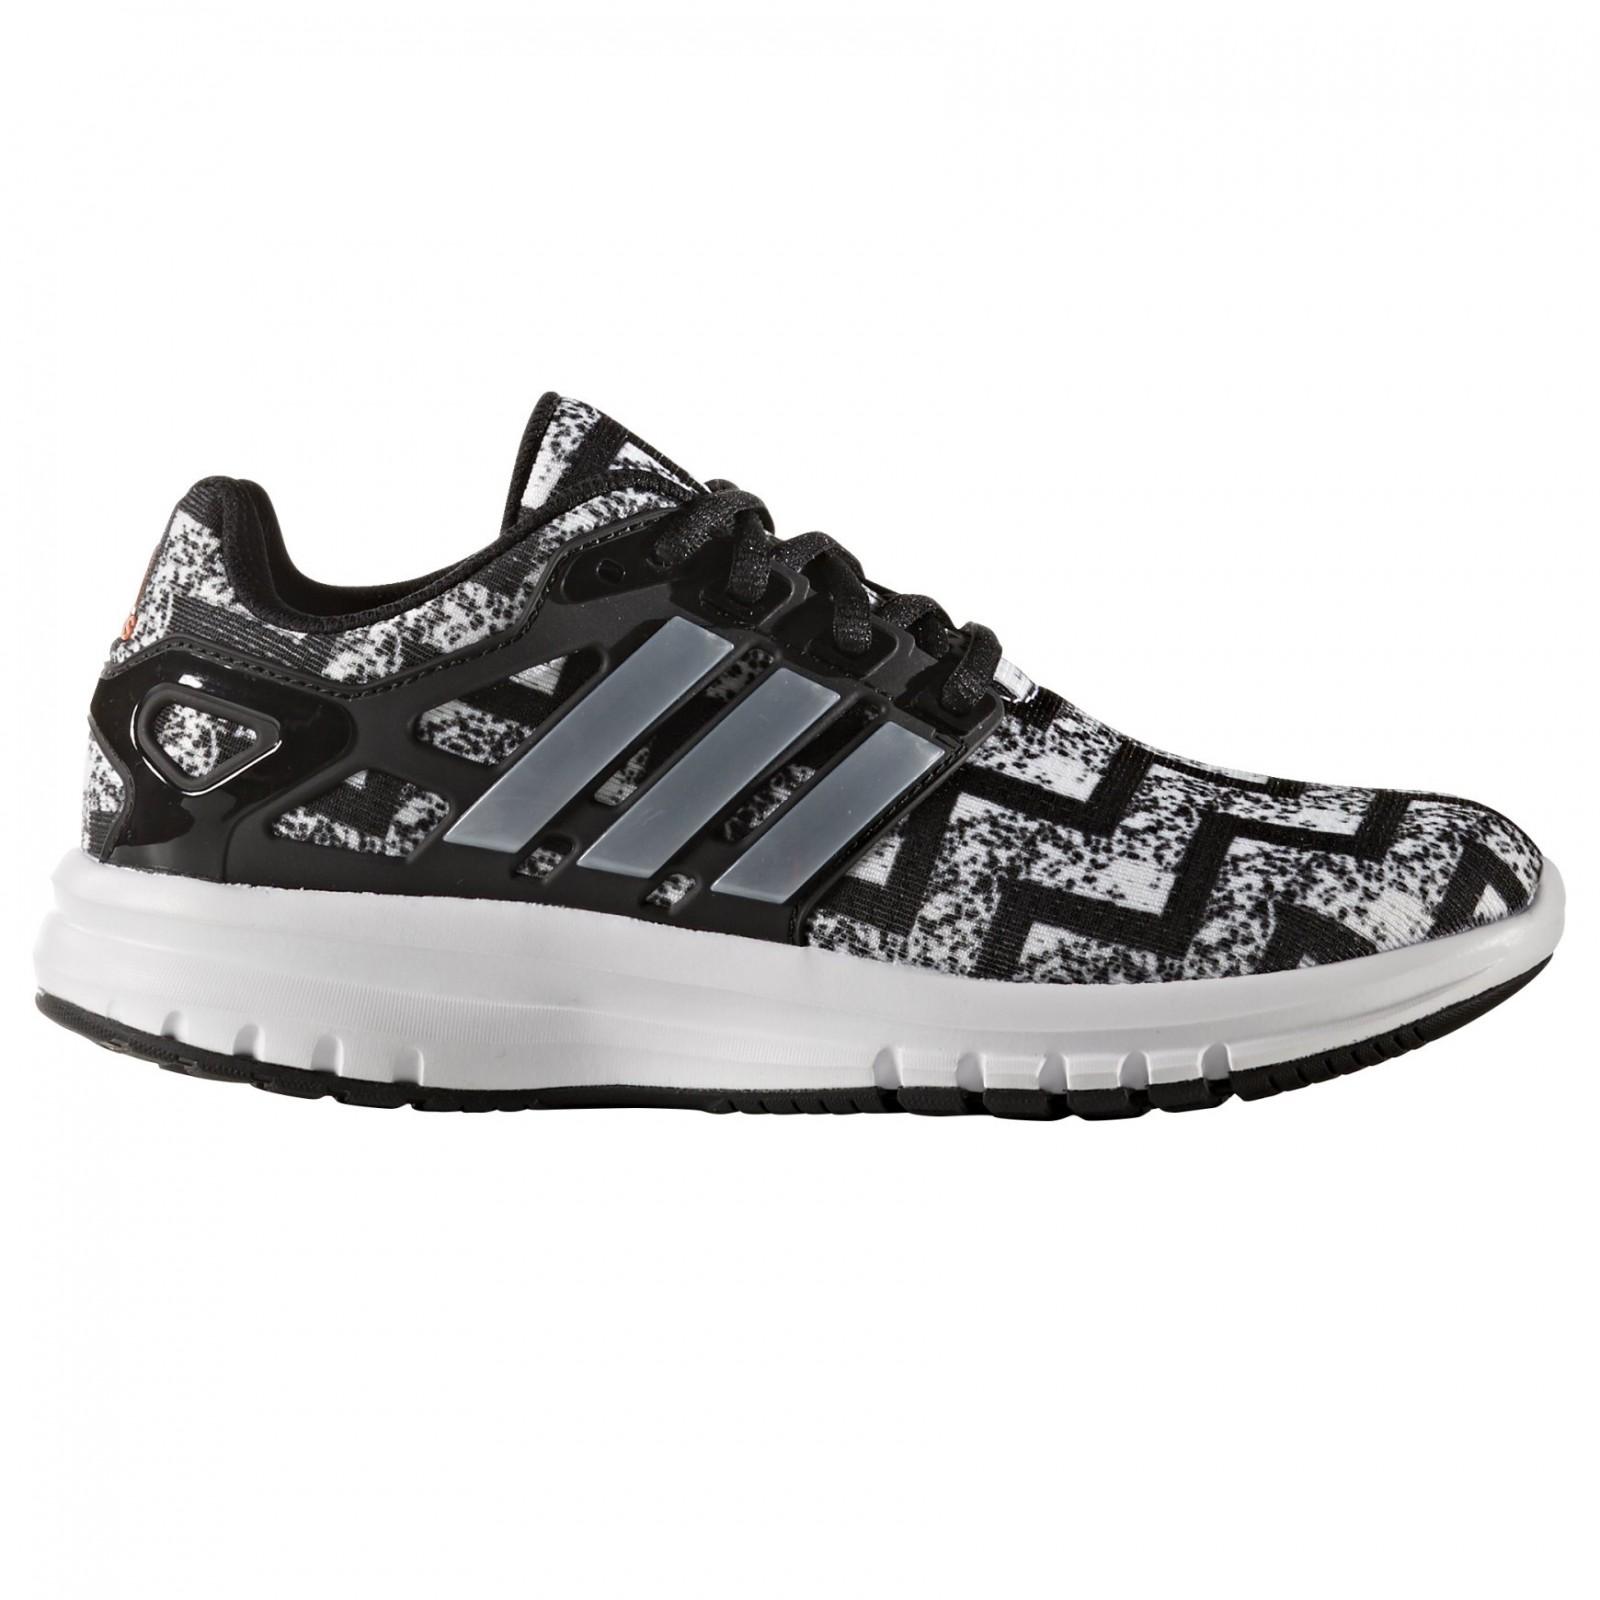 Dětské běžecké boty adidas Performance energy cloud k  6cffe82978